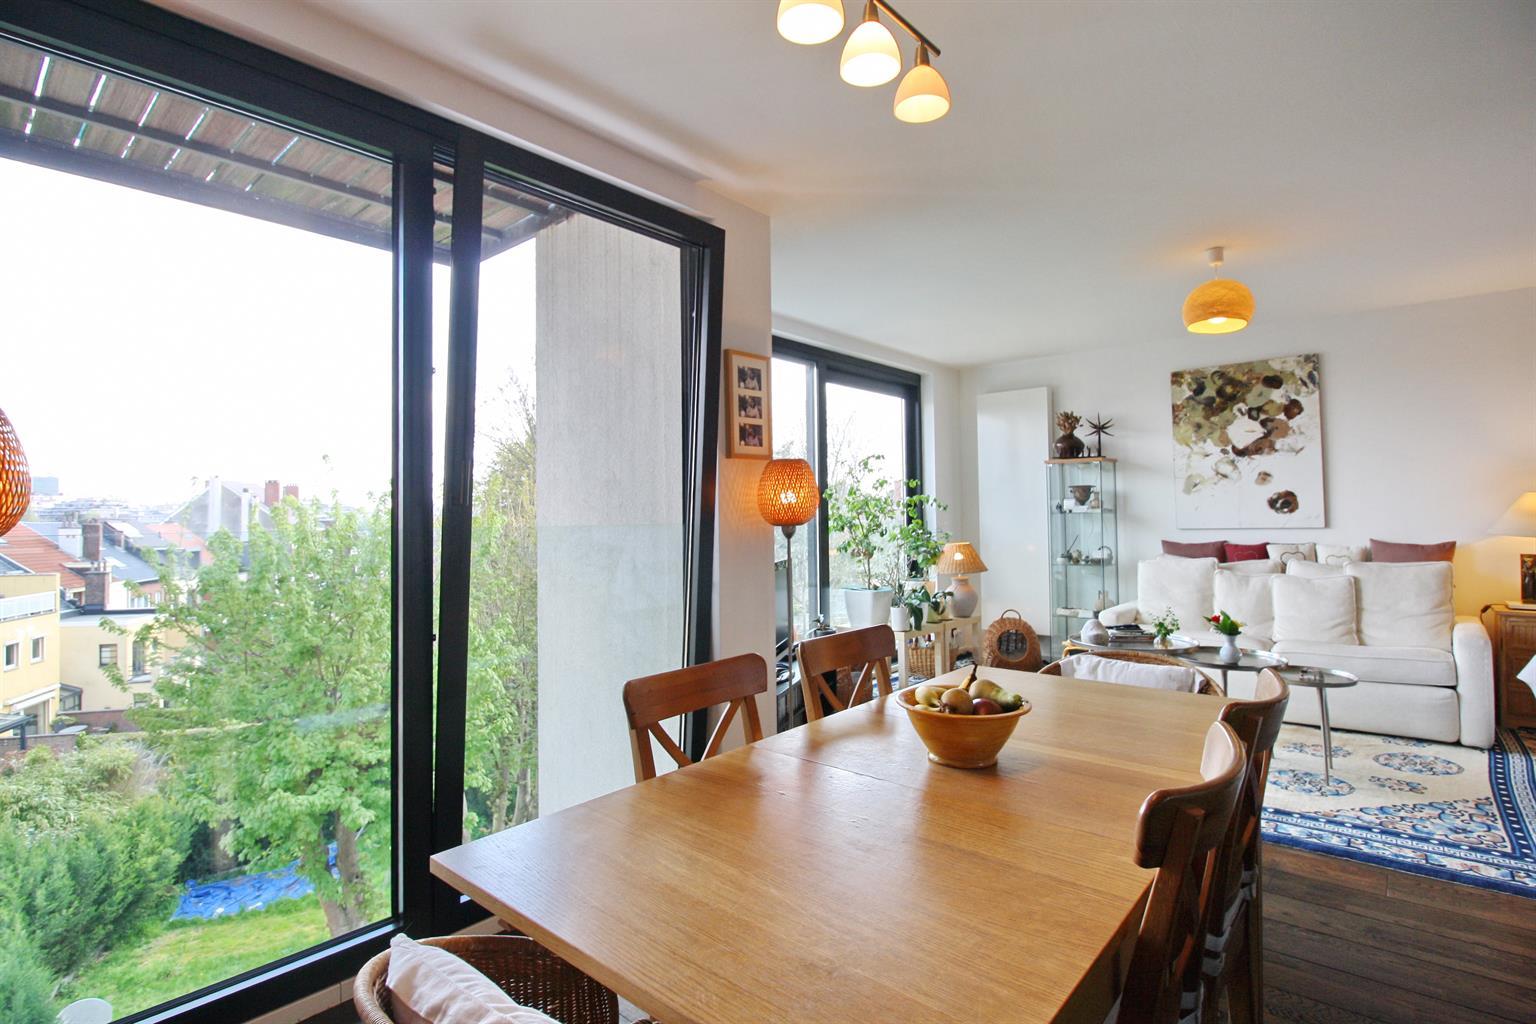 Penthouse - Berchem-Sainte-Agathe - #4346071-5